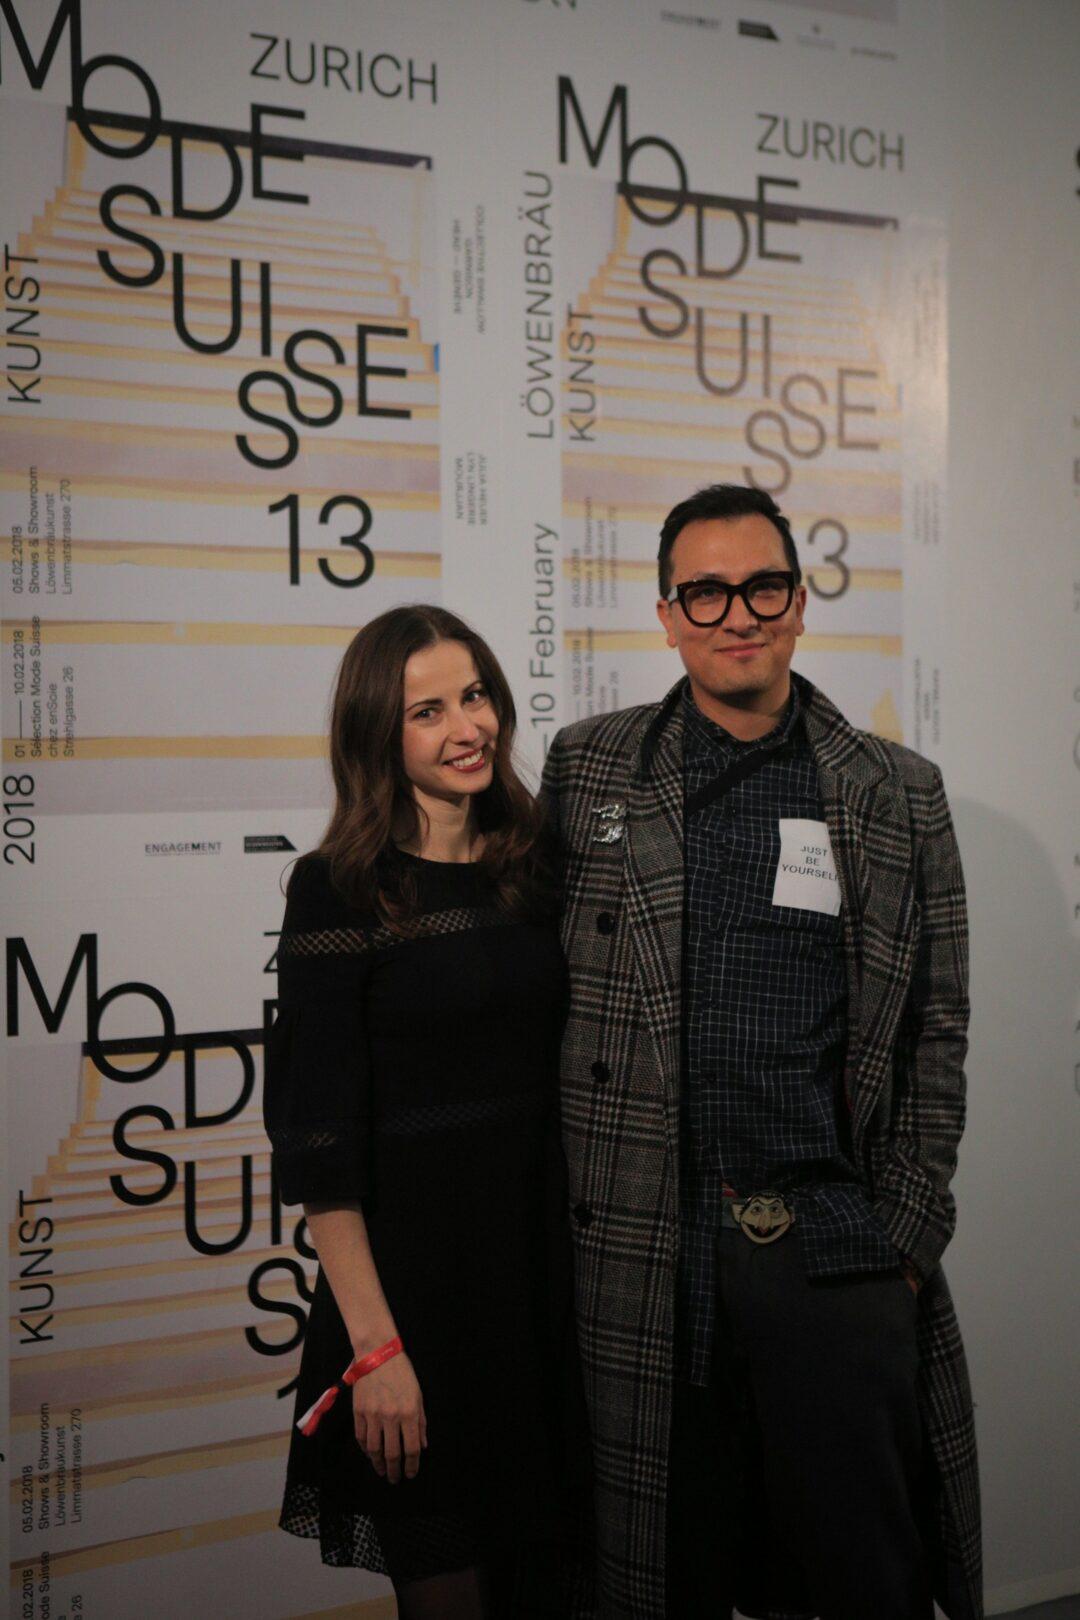 With a creative Juli Bohorquez from Mycosmicworld